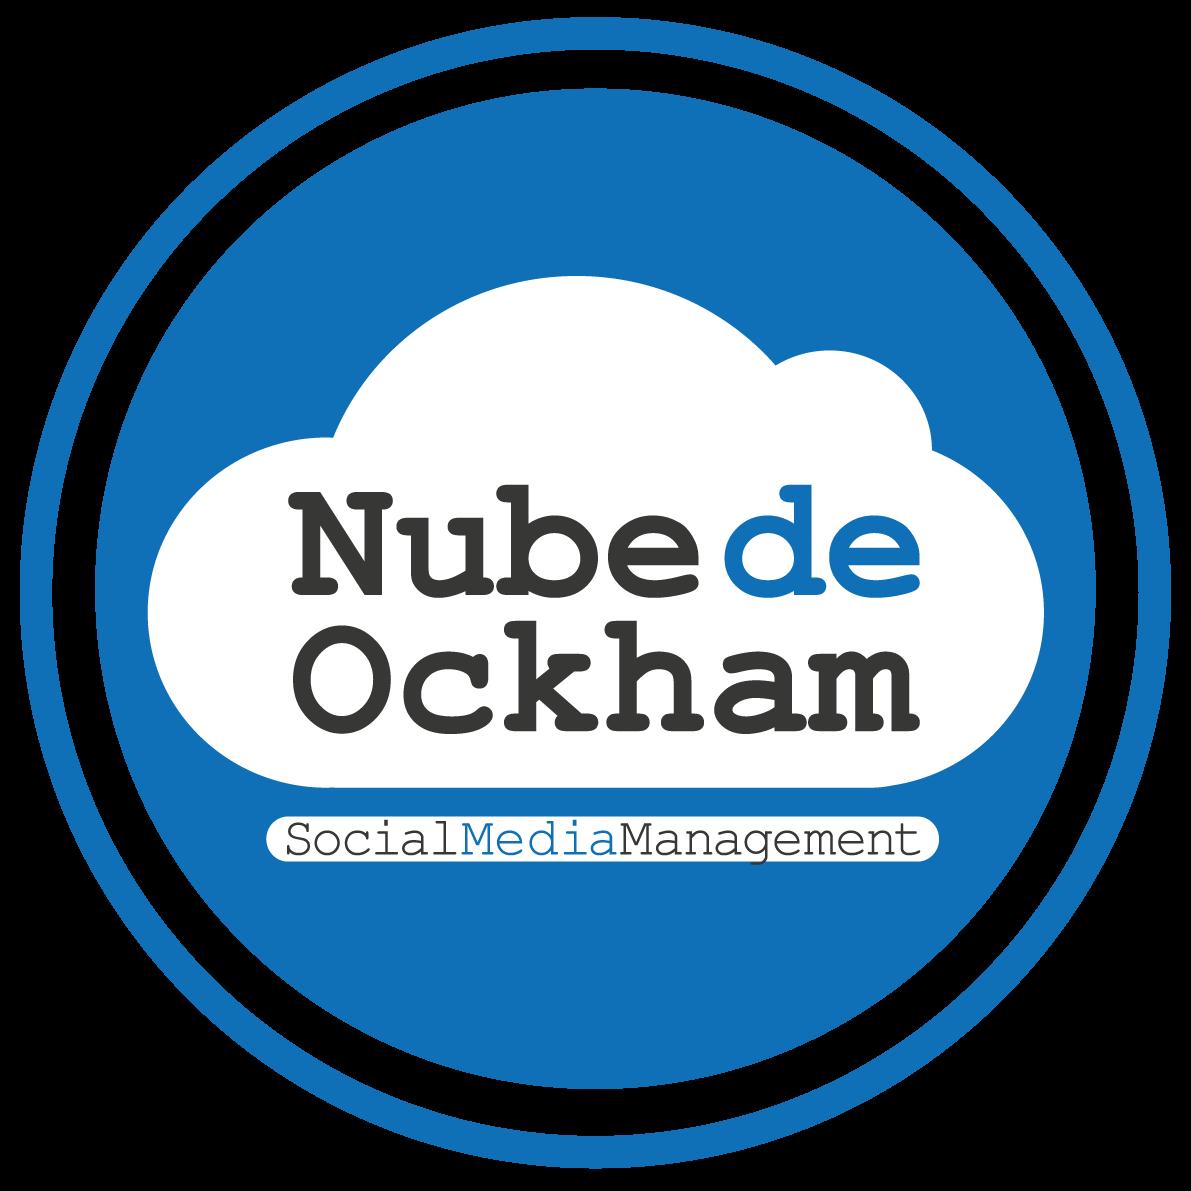 Nube de Ockham